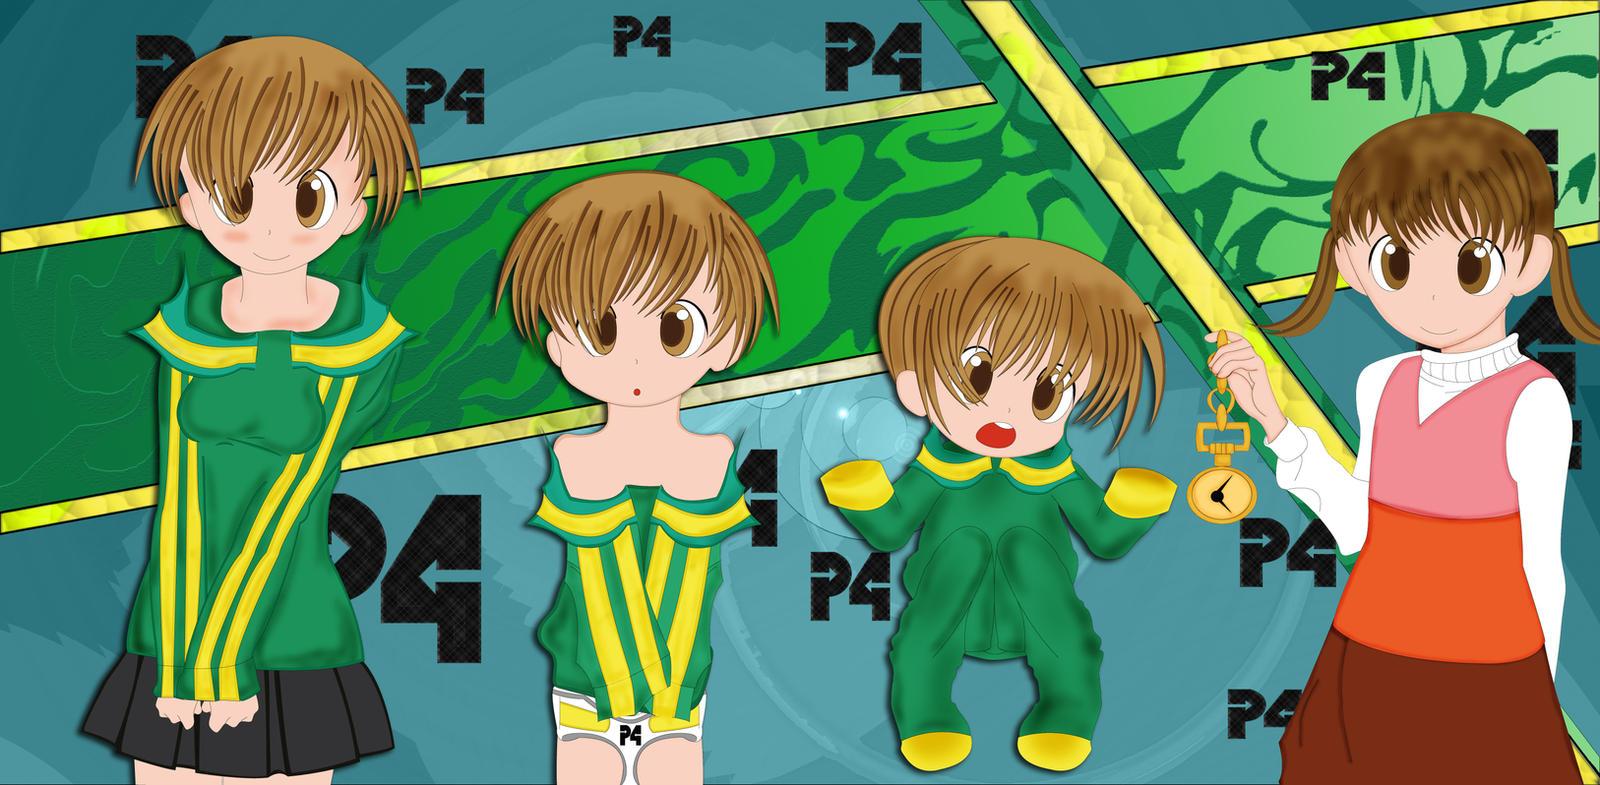 Persona 4 dating nanako anime 2